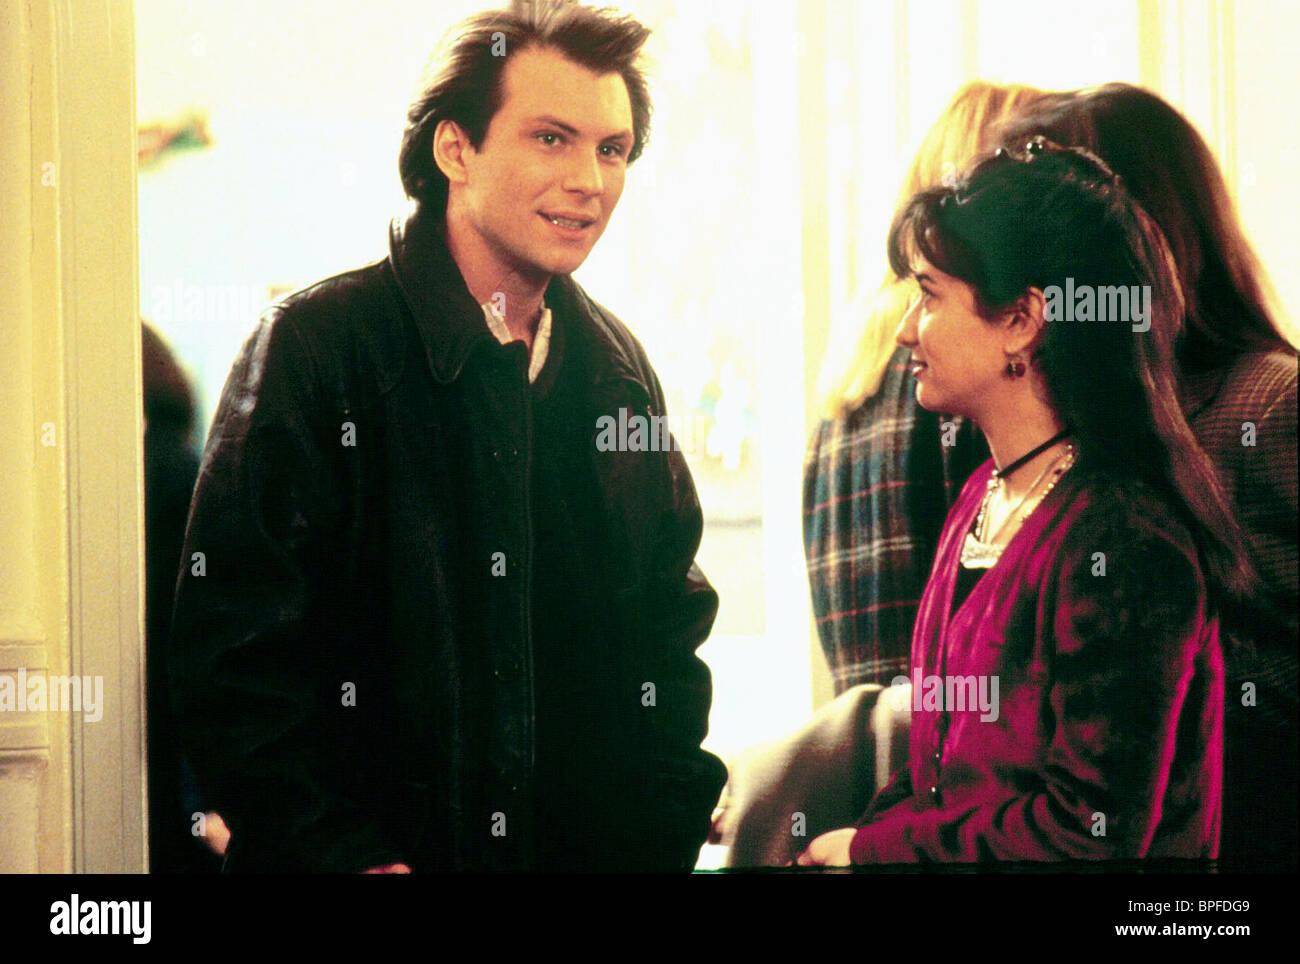 Christian Slater Bed Of Roses 1996 Stock Photo 31072729